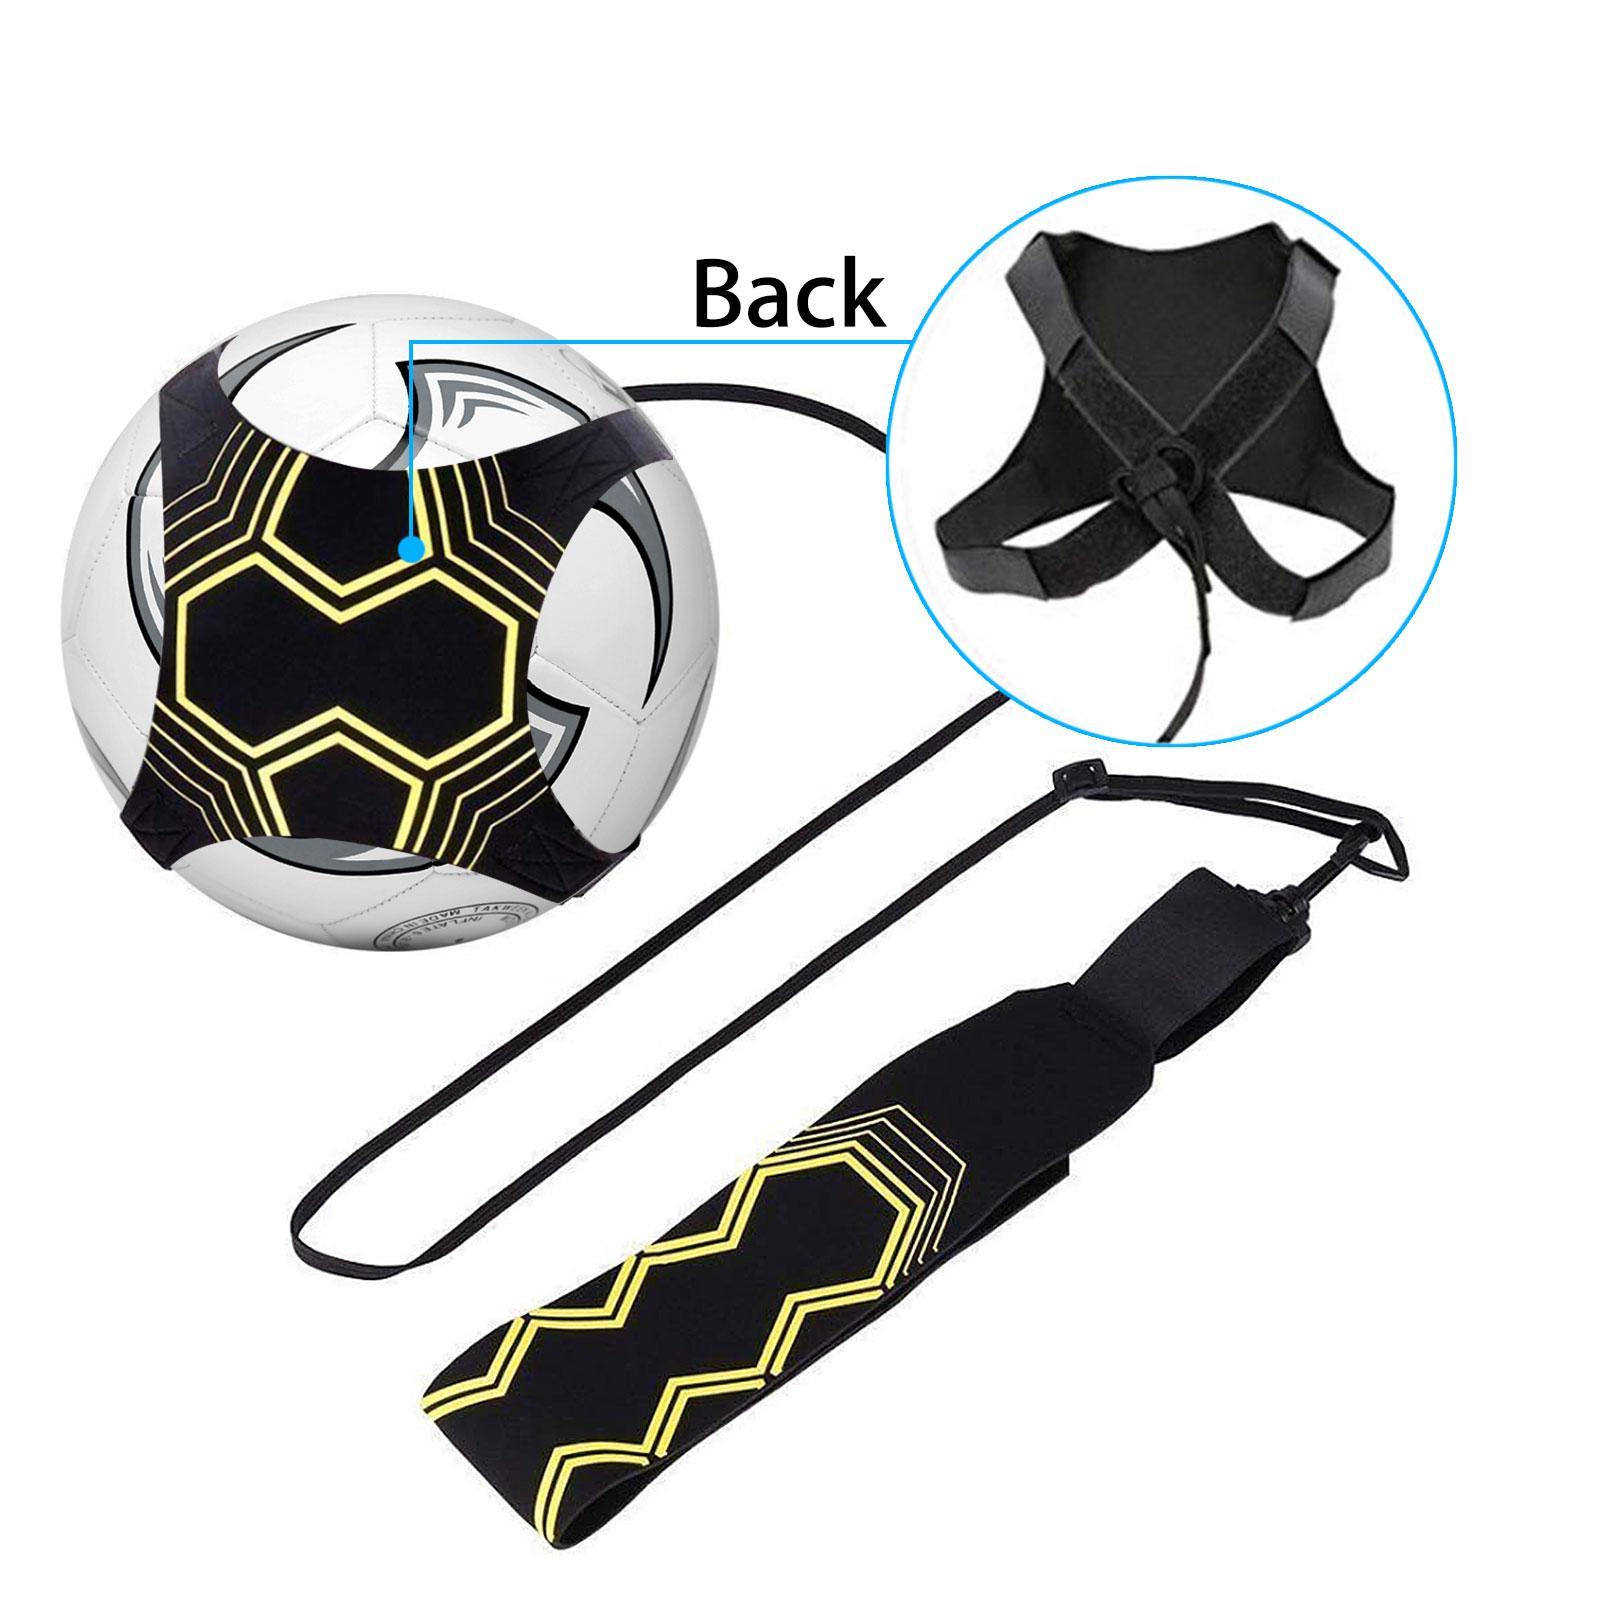 Adjustable Football Kick Trainer Soccer Ball Train Equipment Practice Belt FG#1